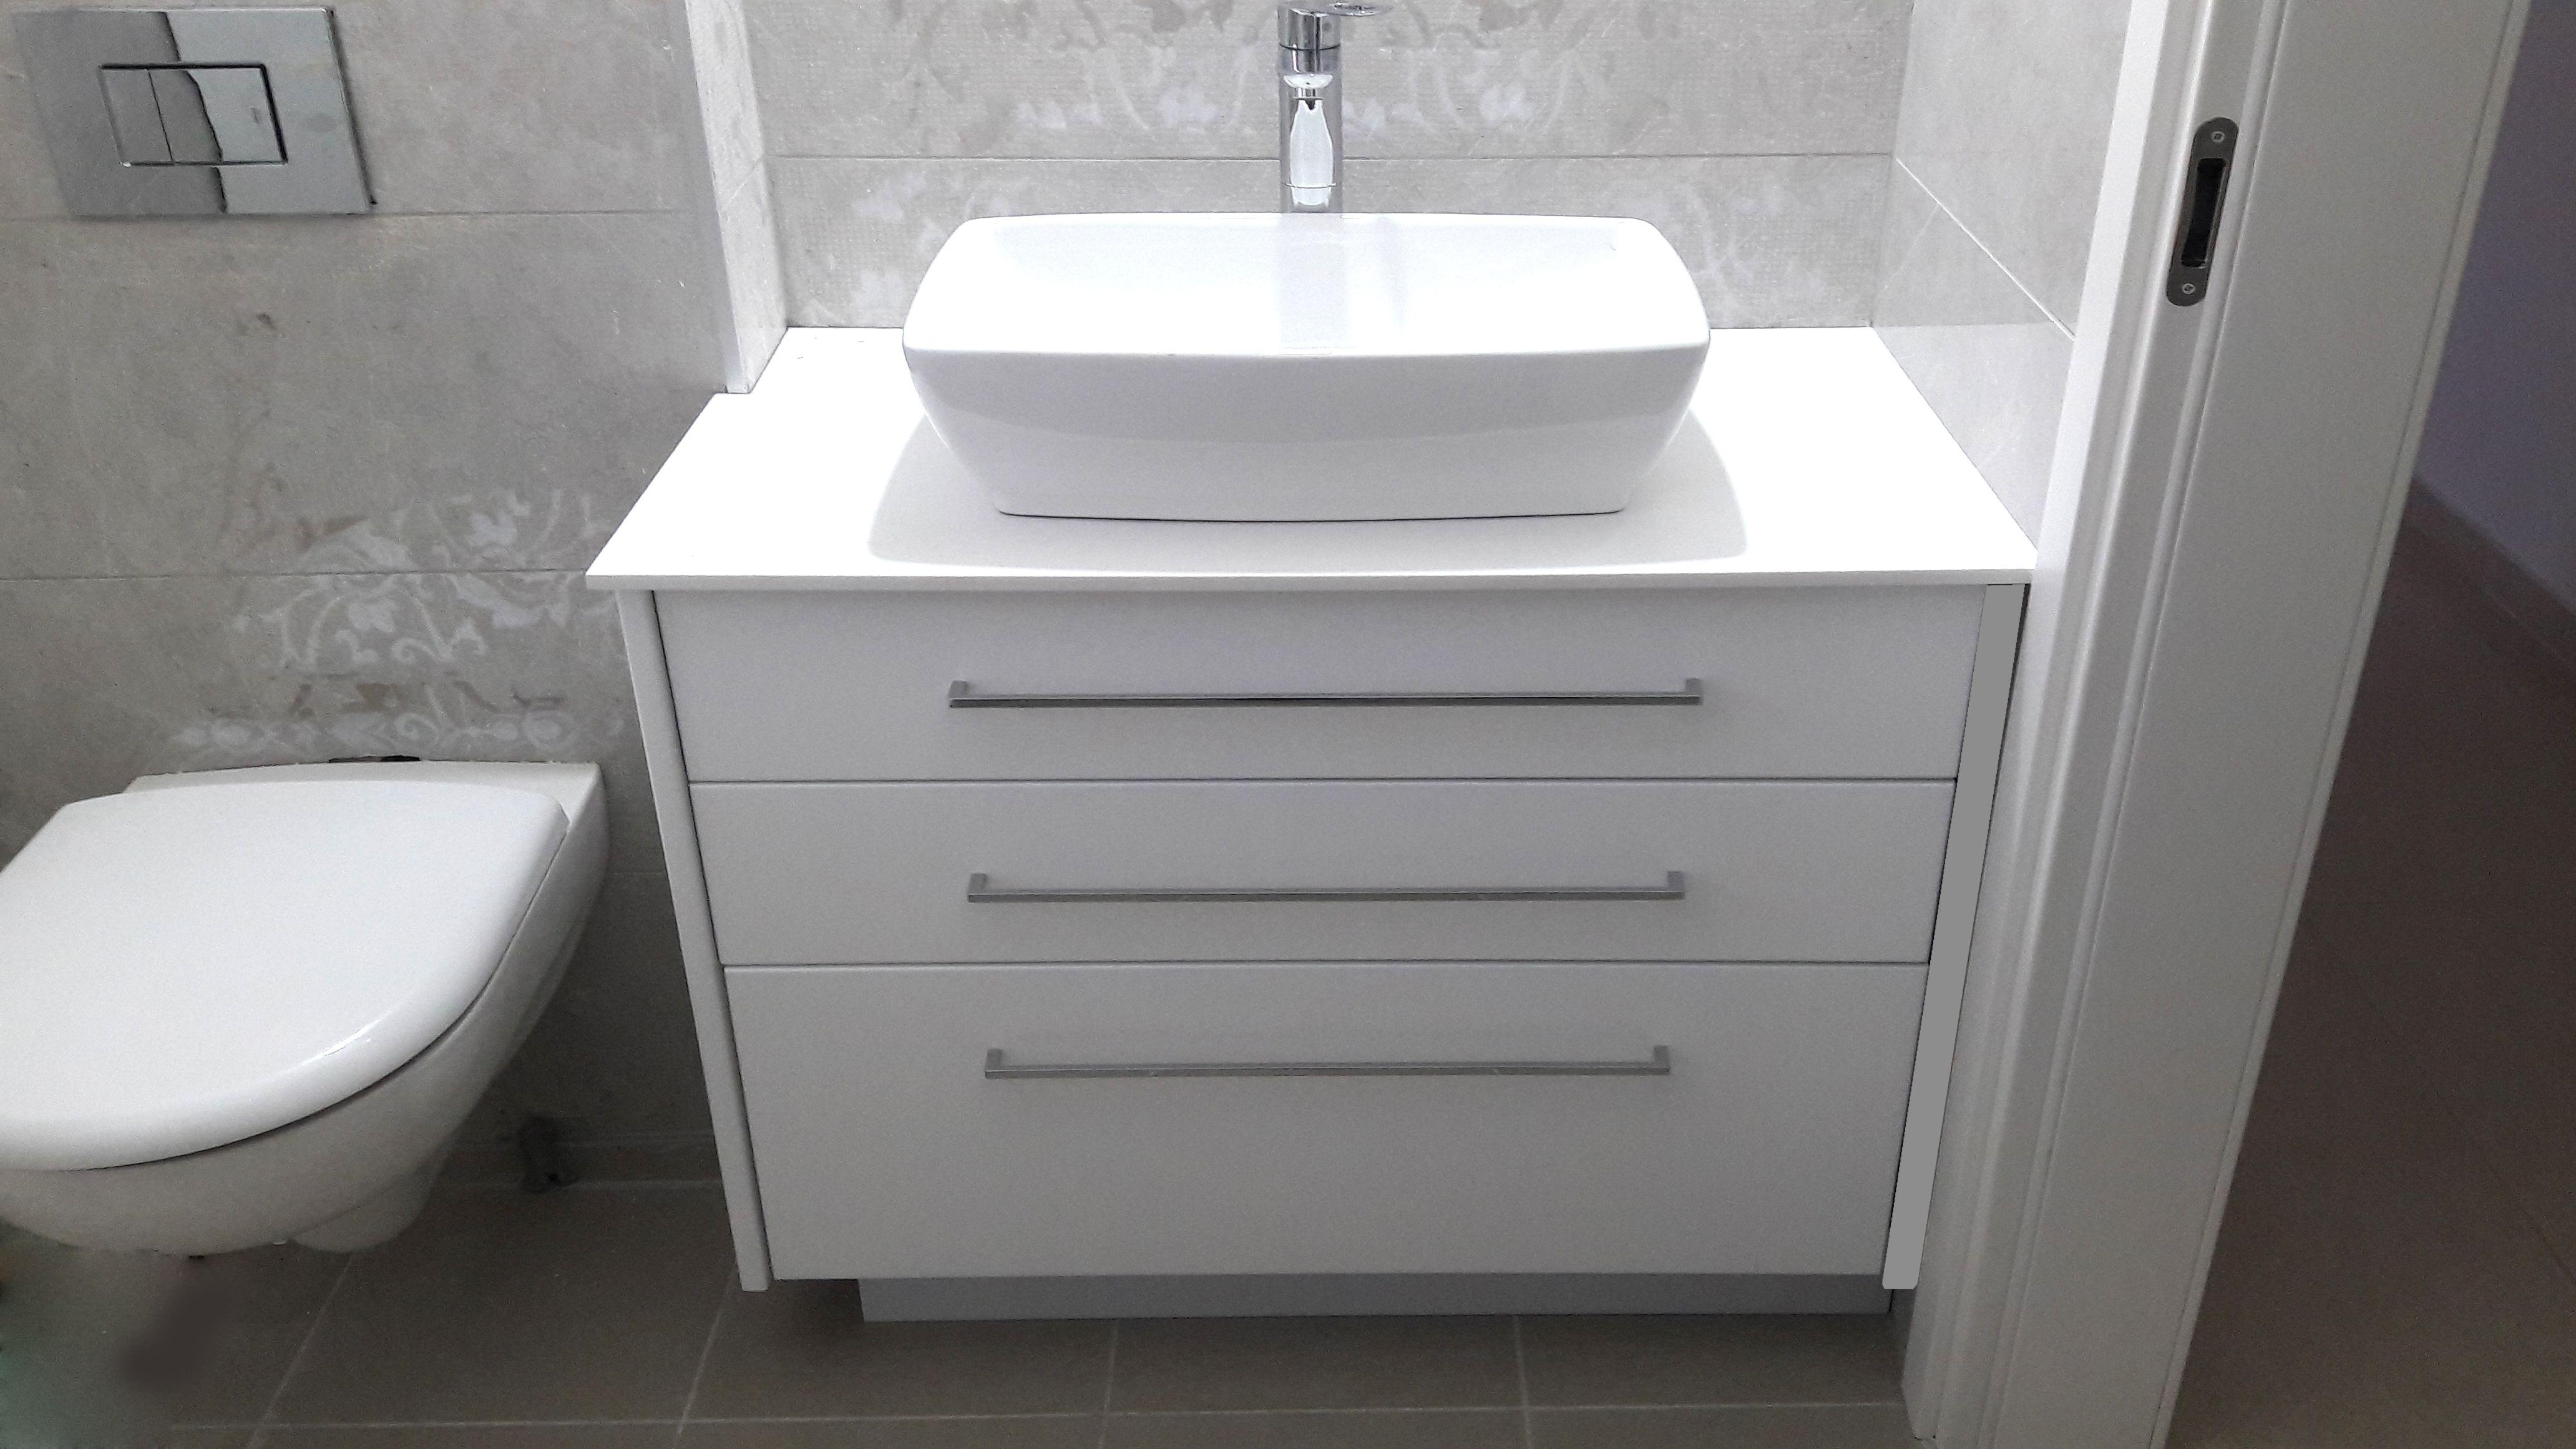 Bathroom Cabinets Bathroom Cabinets Uk Bathroom Storage & Pin by ?? ???? // Etsmarket on bathroom cabinets | Pinterest ...